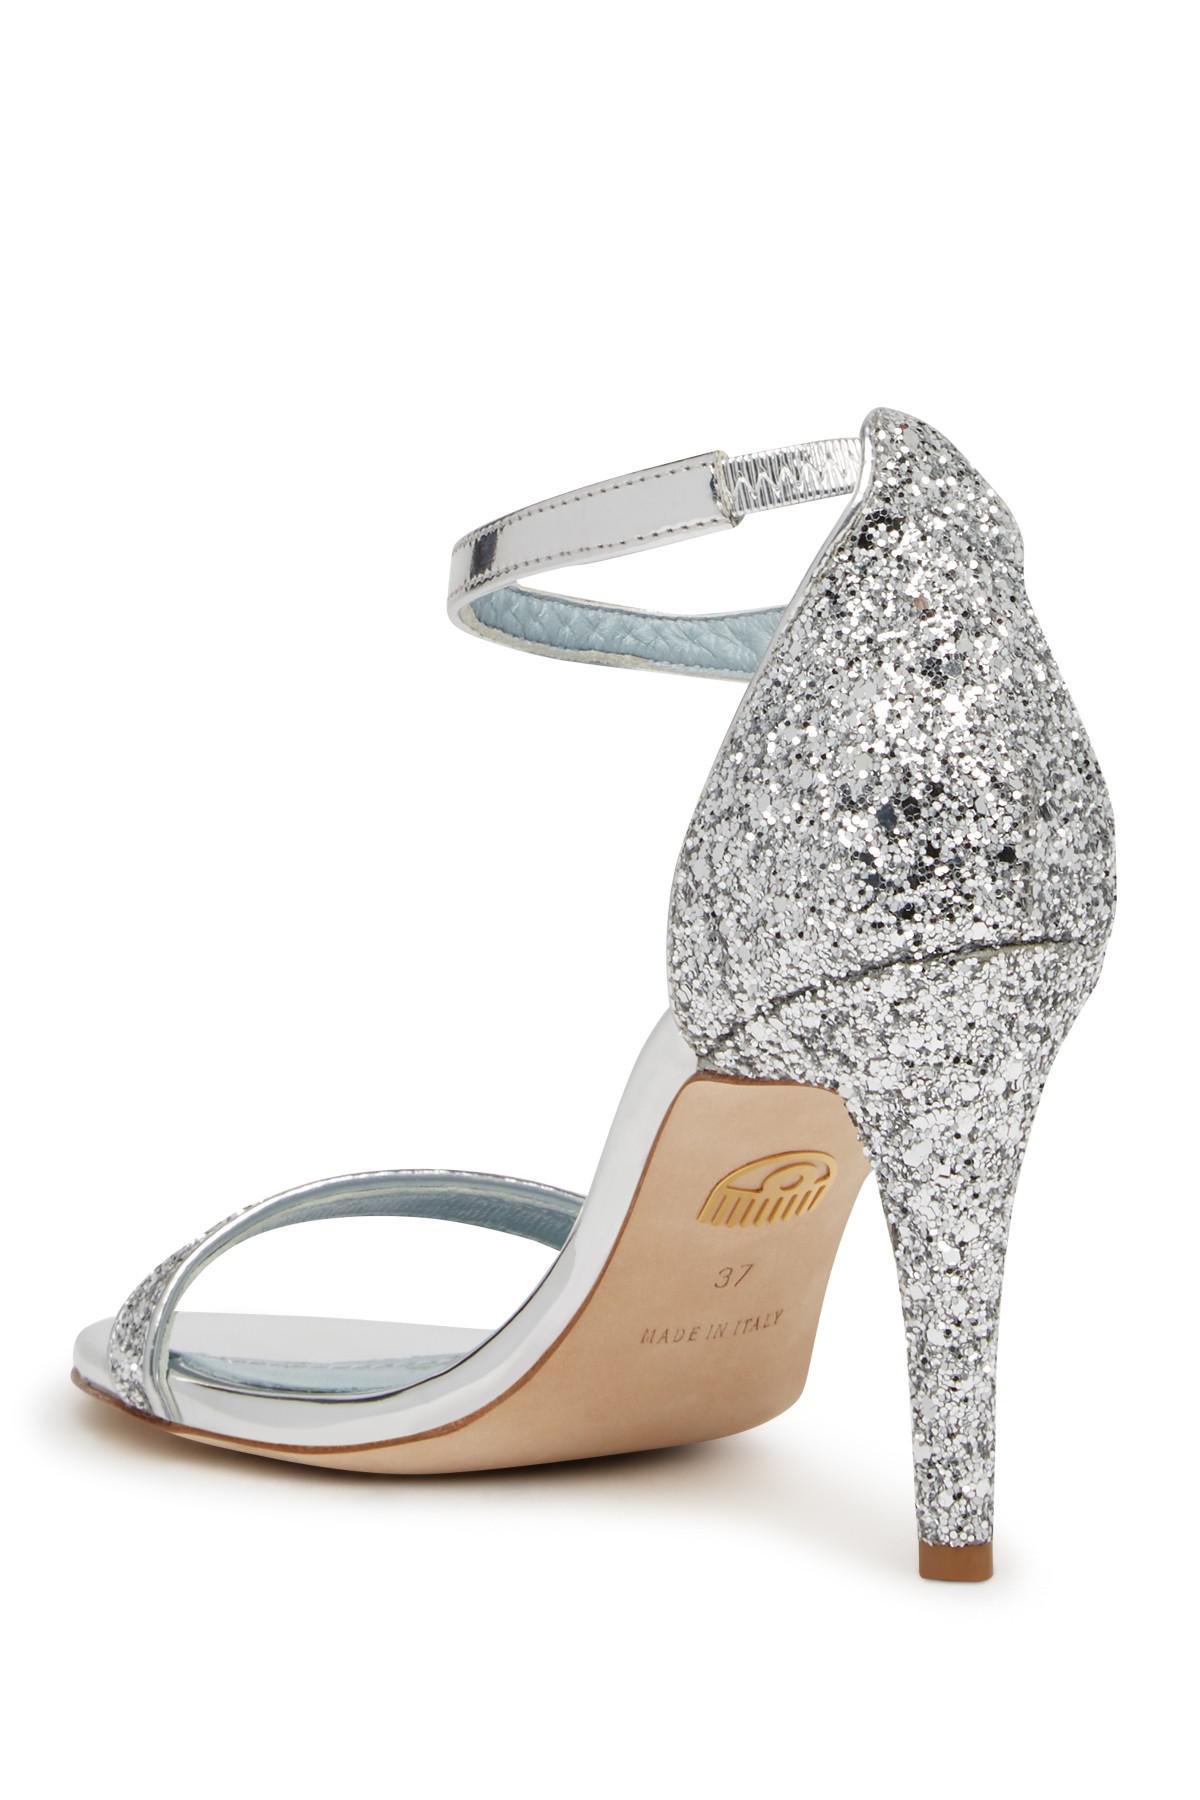 Chiara Ferragni Glitter Strappy High Heel Sandal q2DXO555